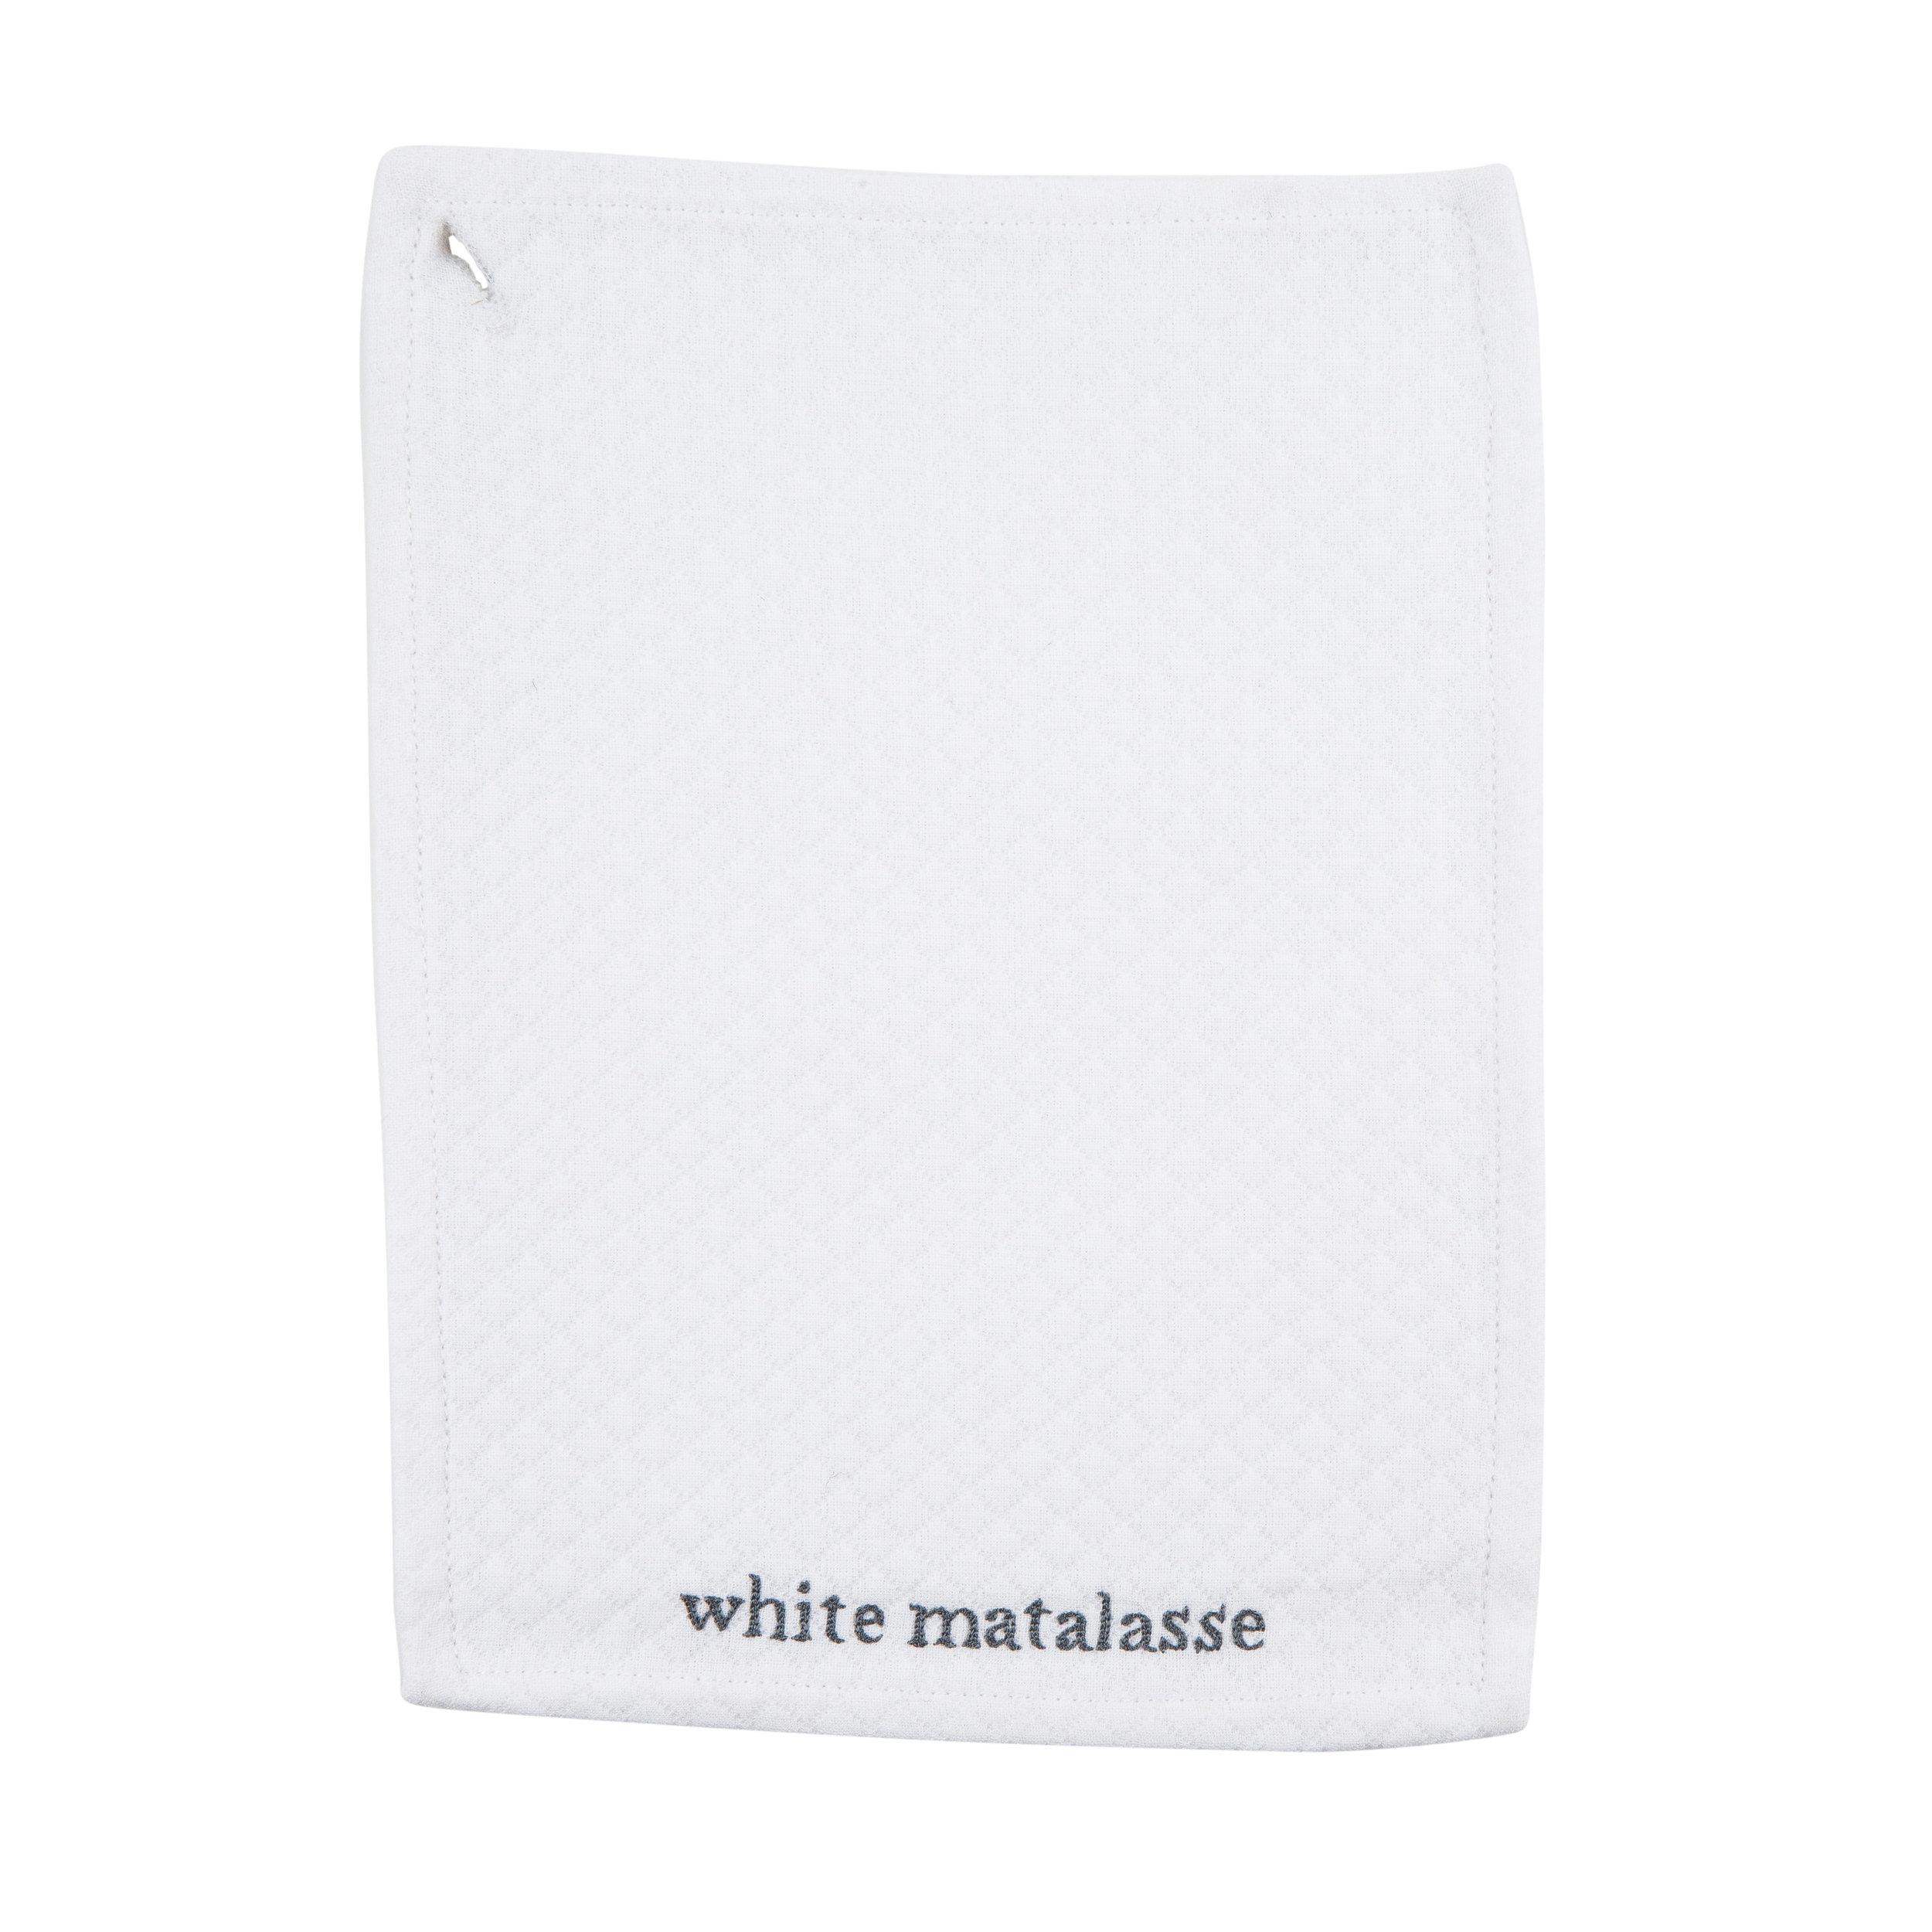 WHITE MATALASSE